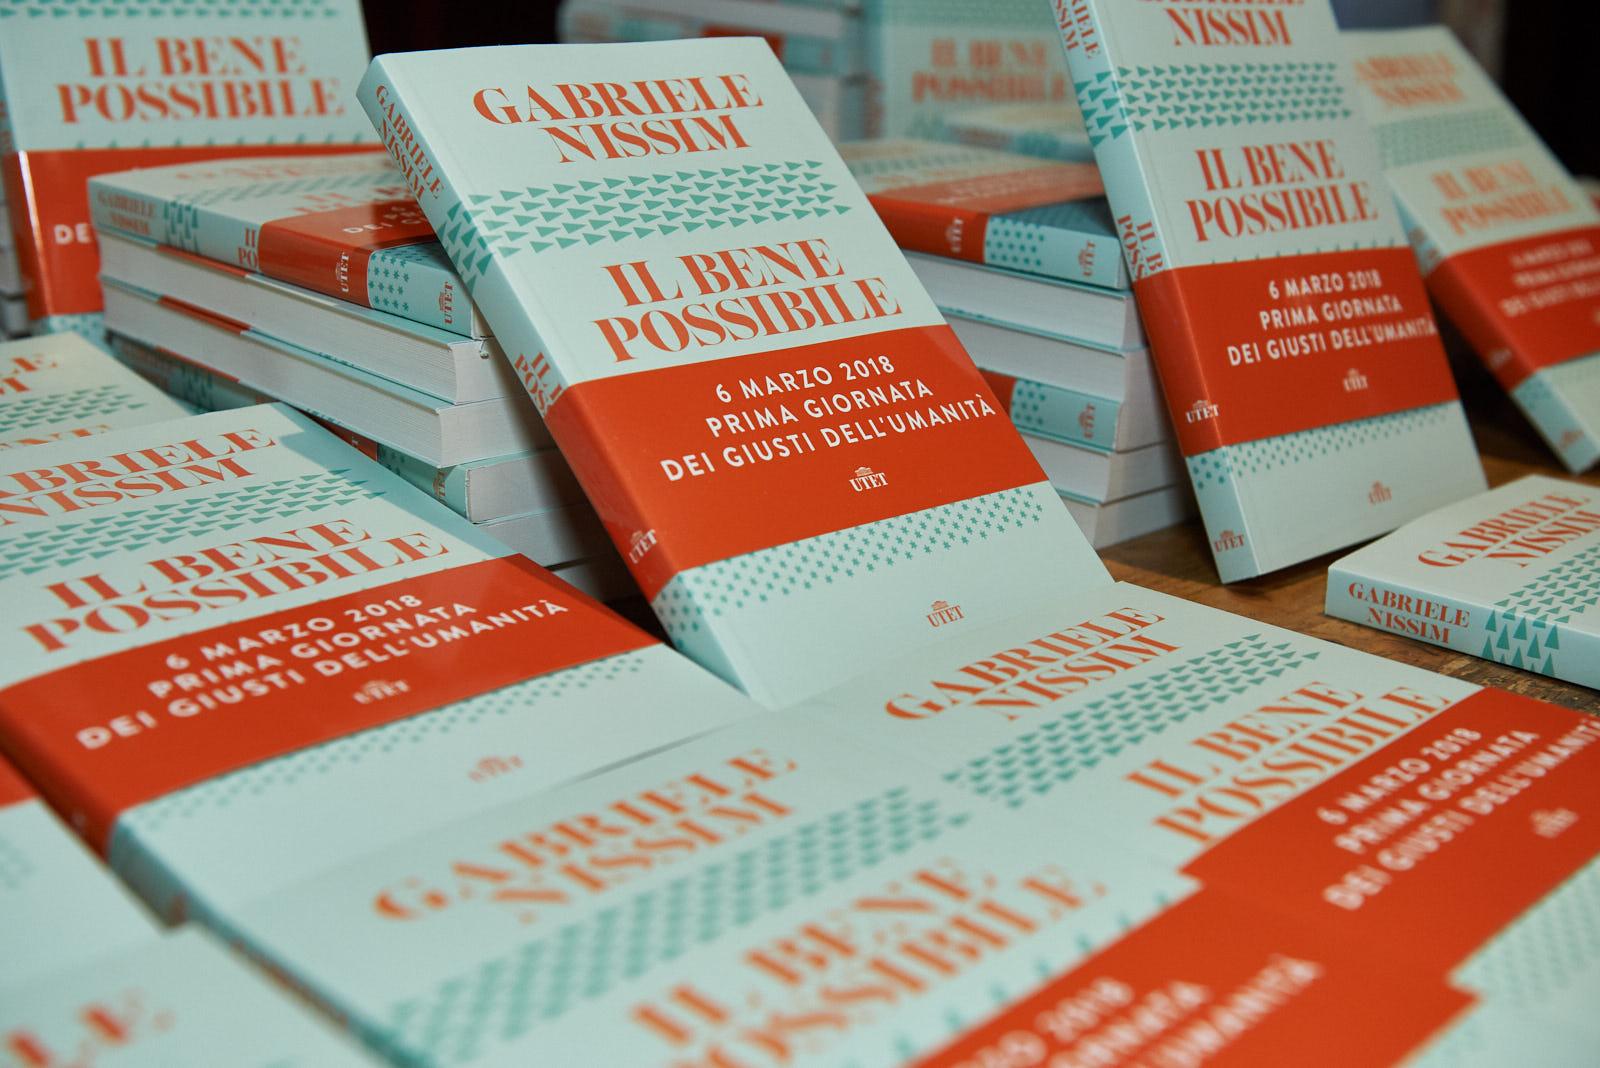 Il bene possibile (Utet) di Gabriele Nissim